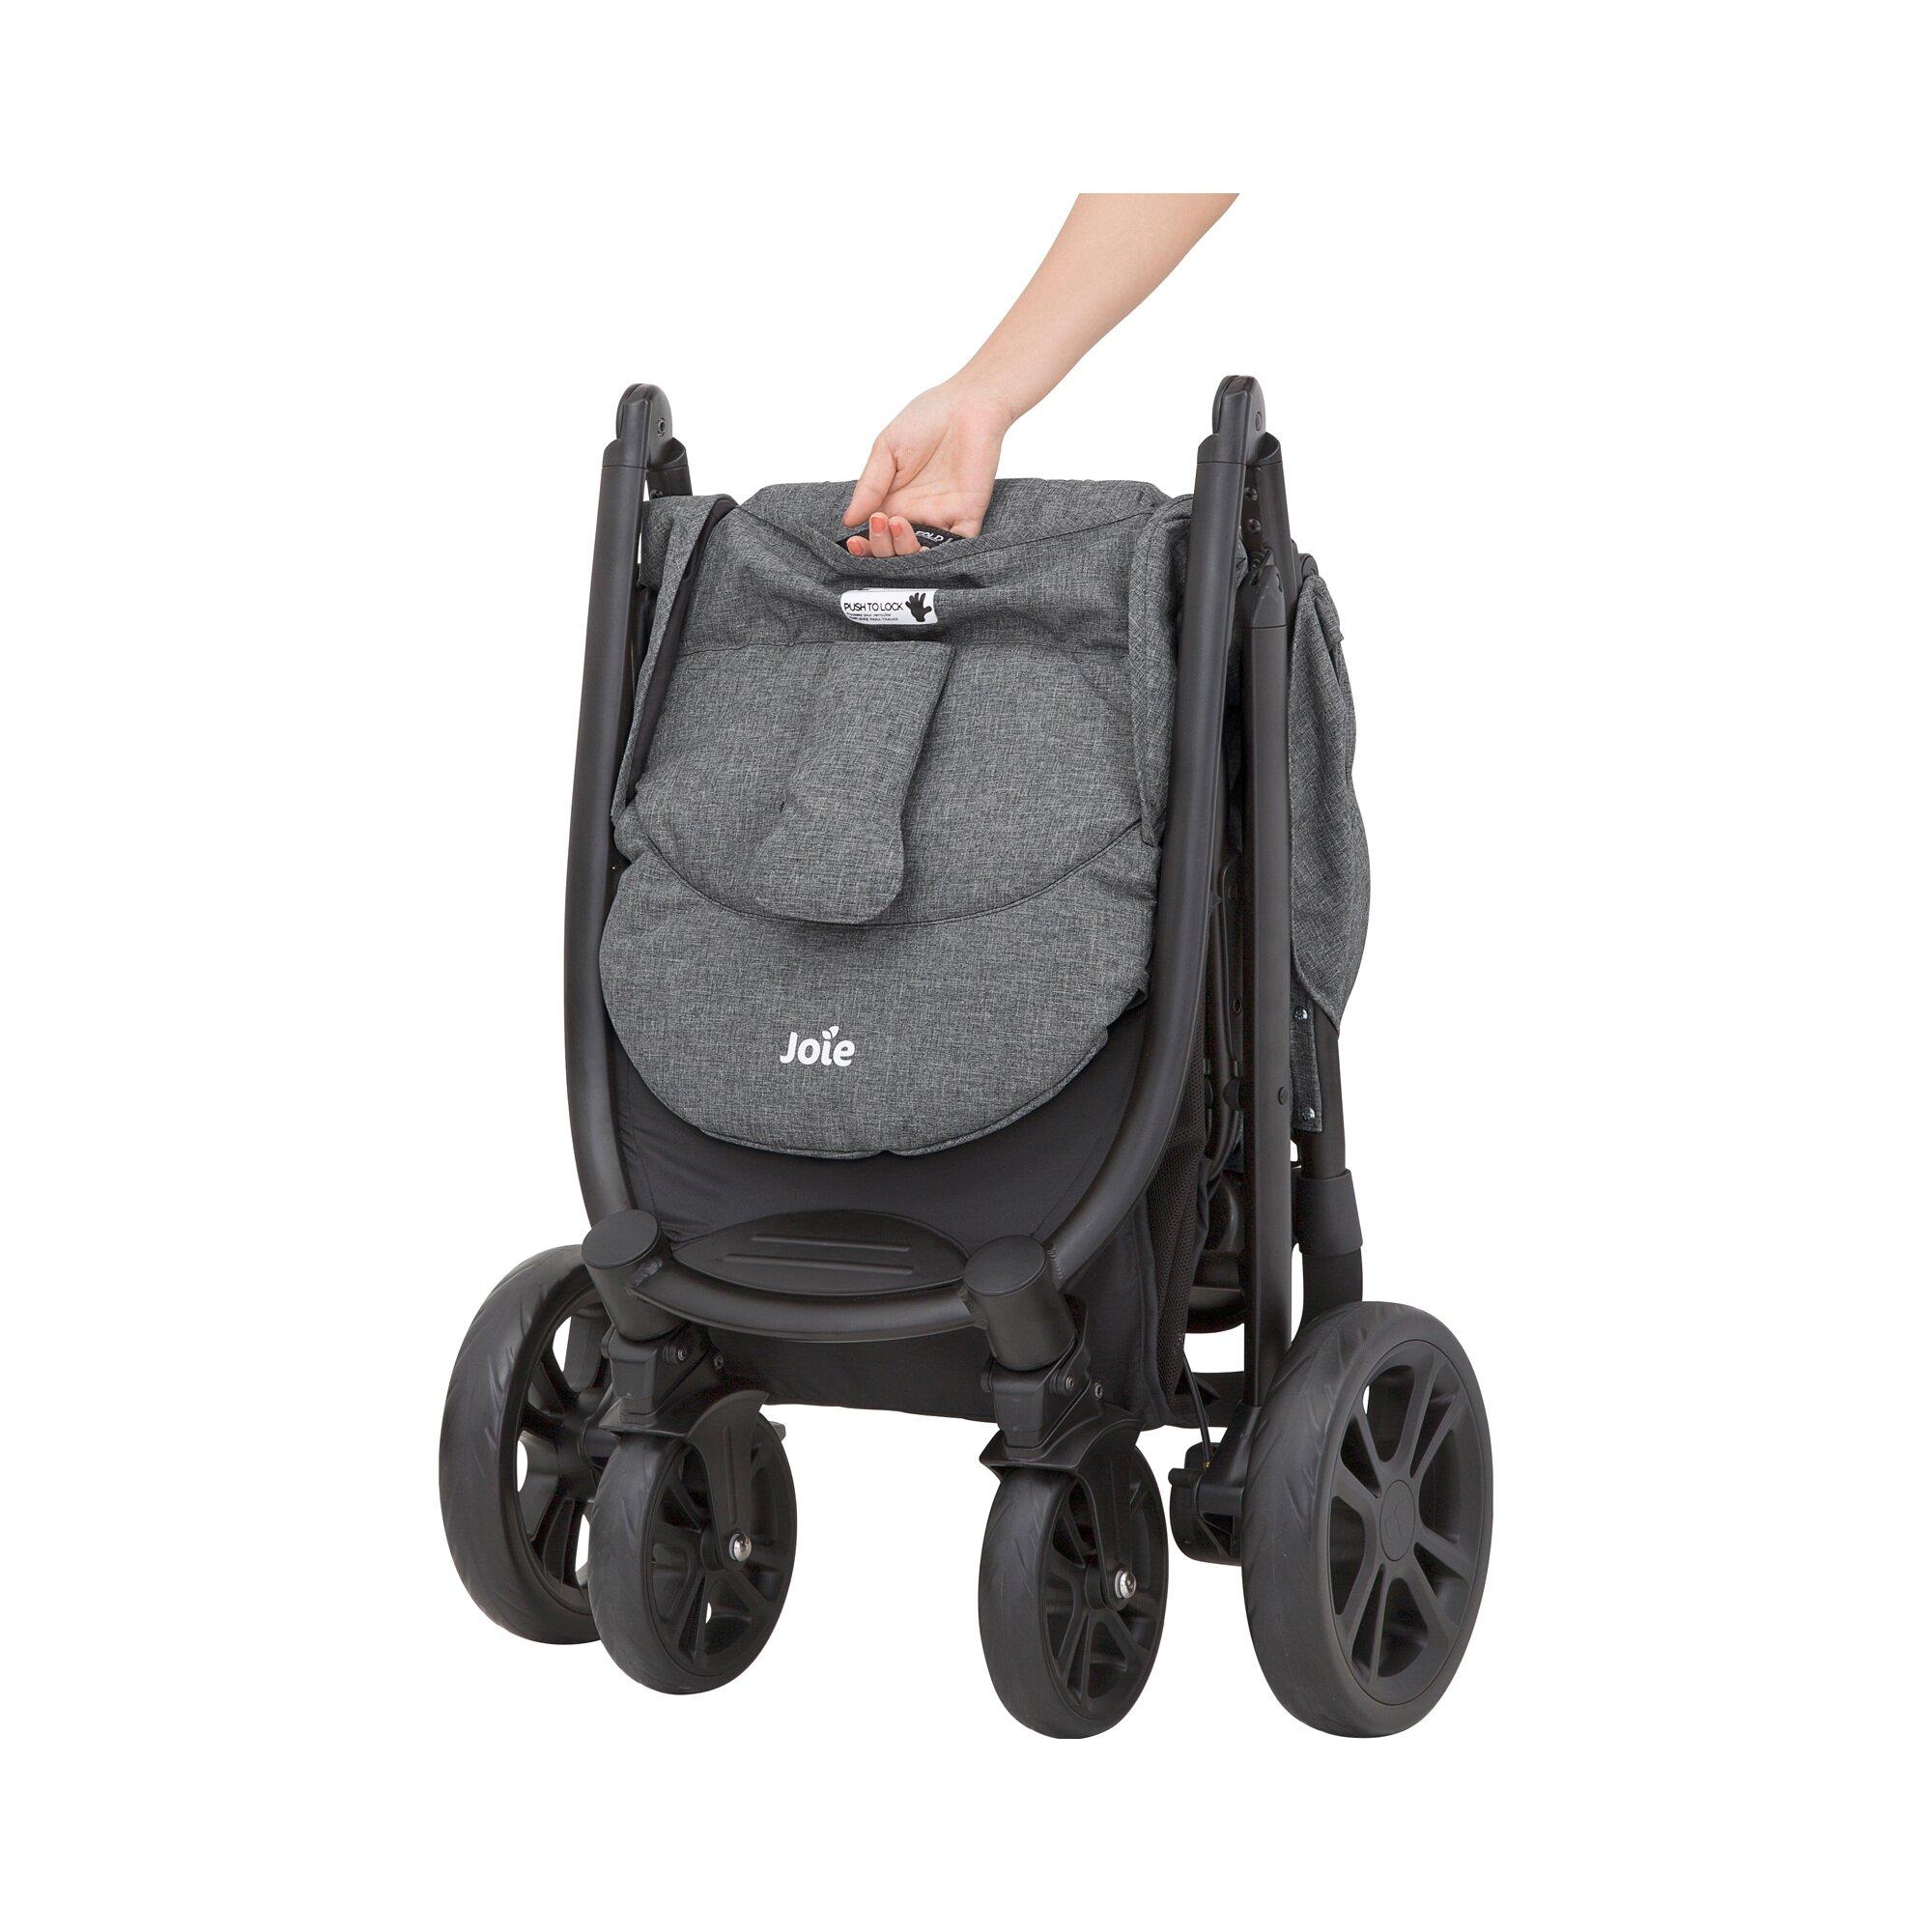 joie-litetrax-4-kinderwagen-sportwagen-design-2018-grau